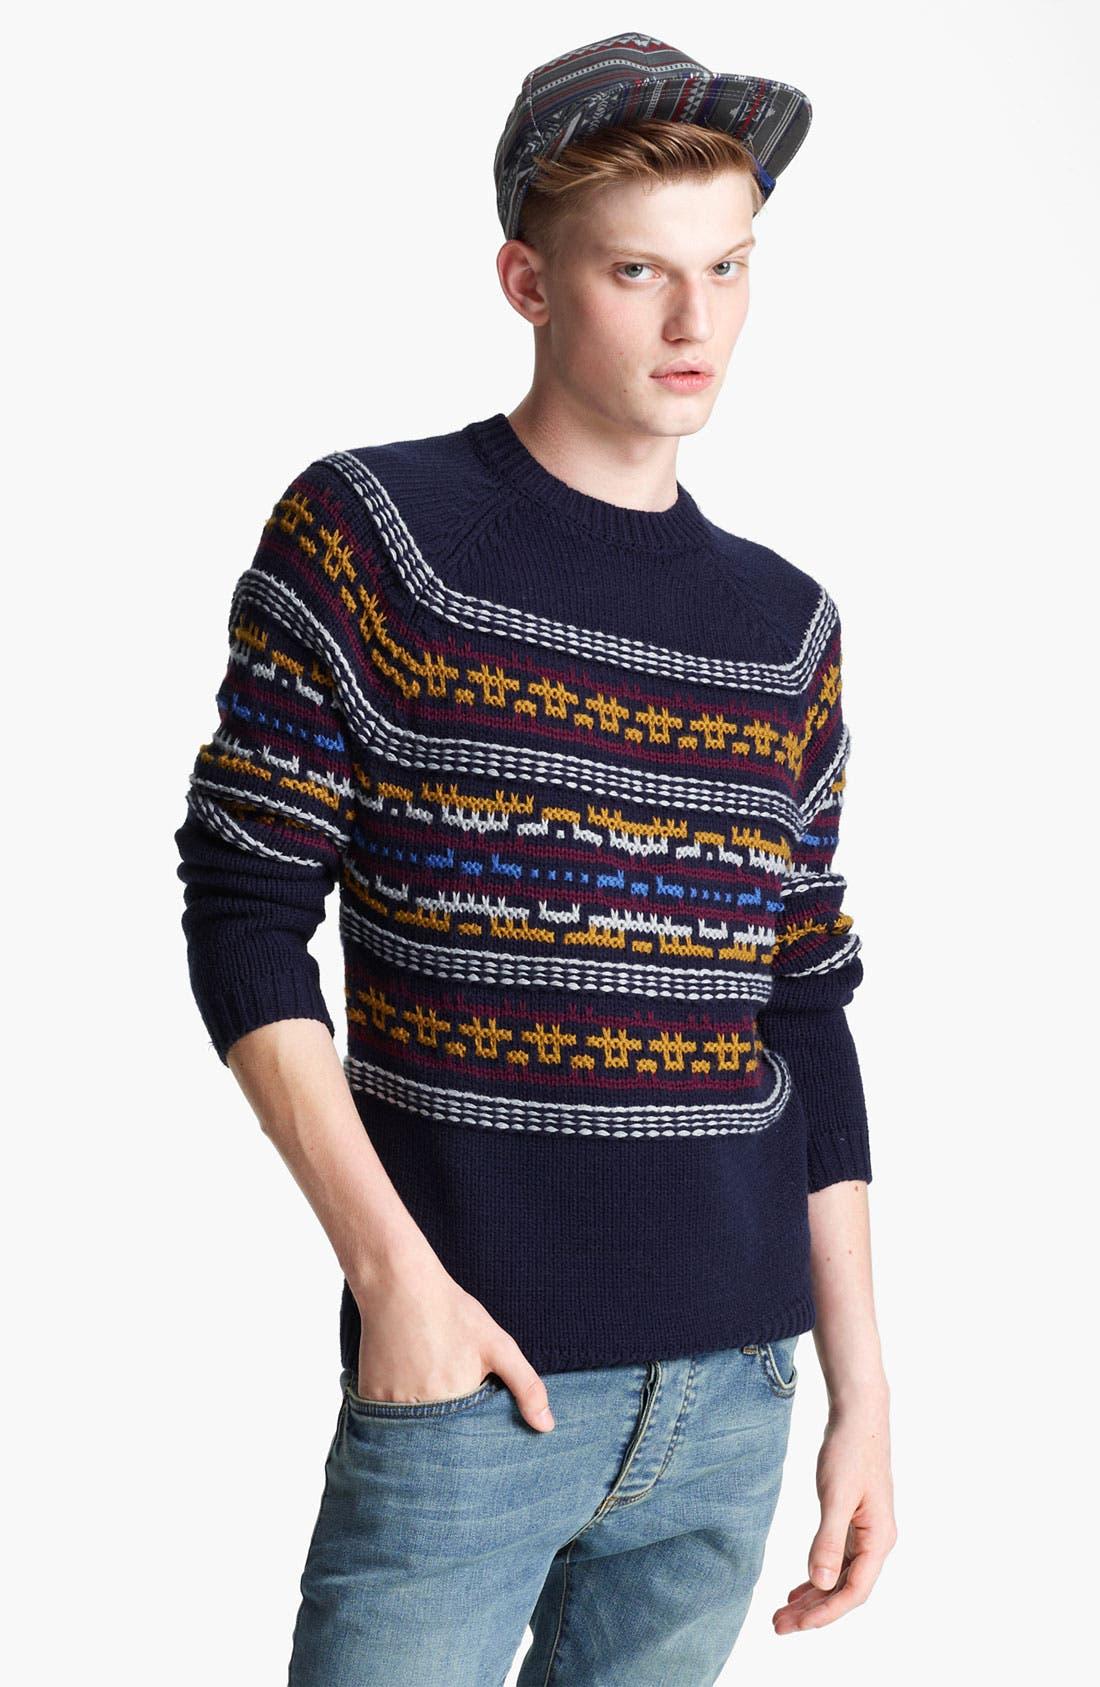 TOPMAN, 'Computer Pattern' Crewneck Sweater, Main thumbnail 1, color, 410